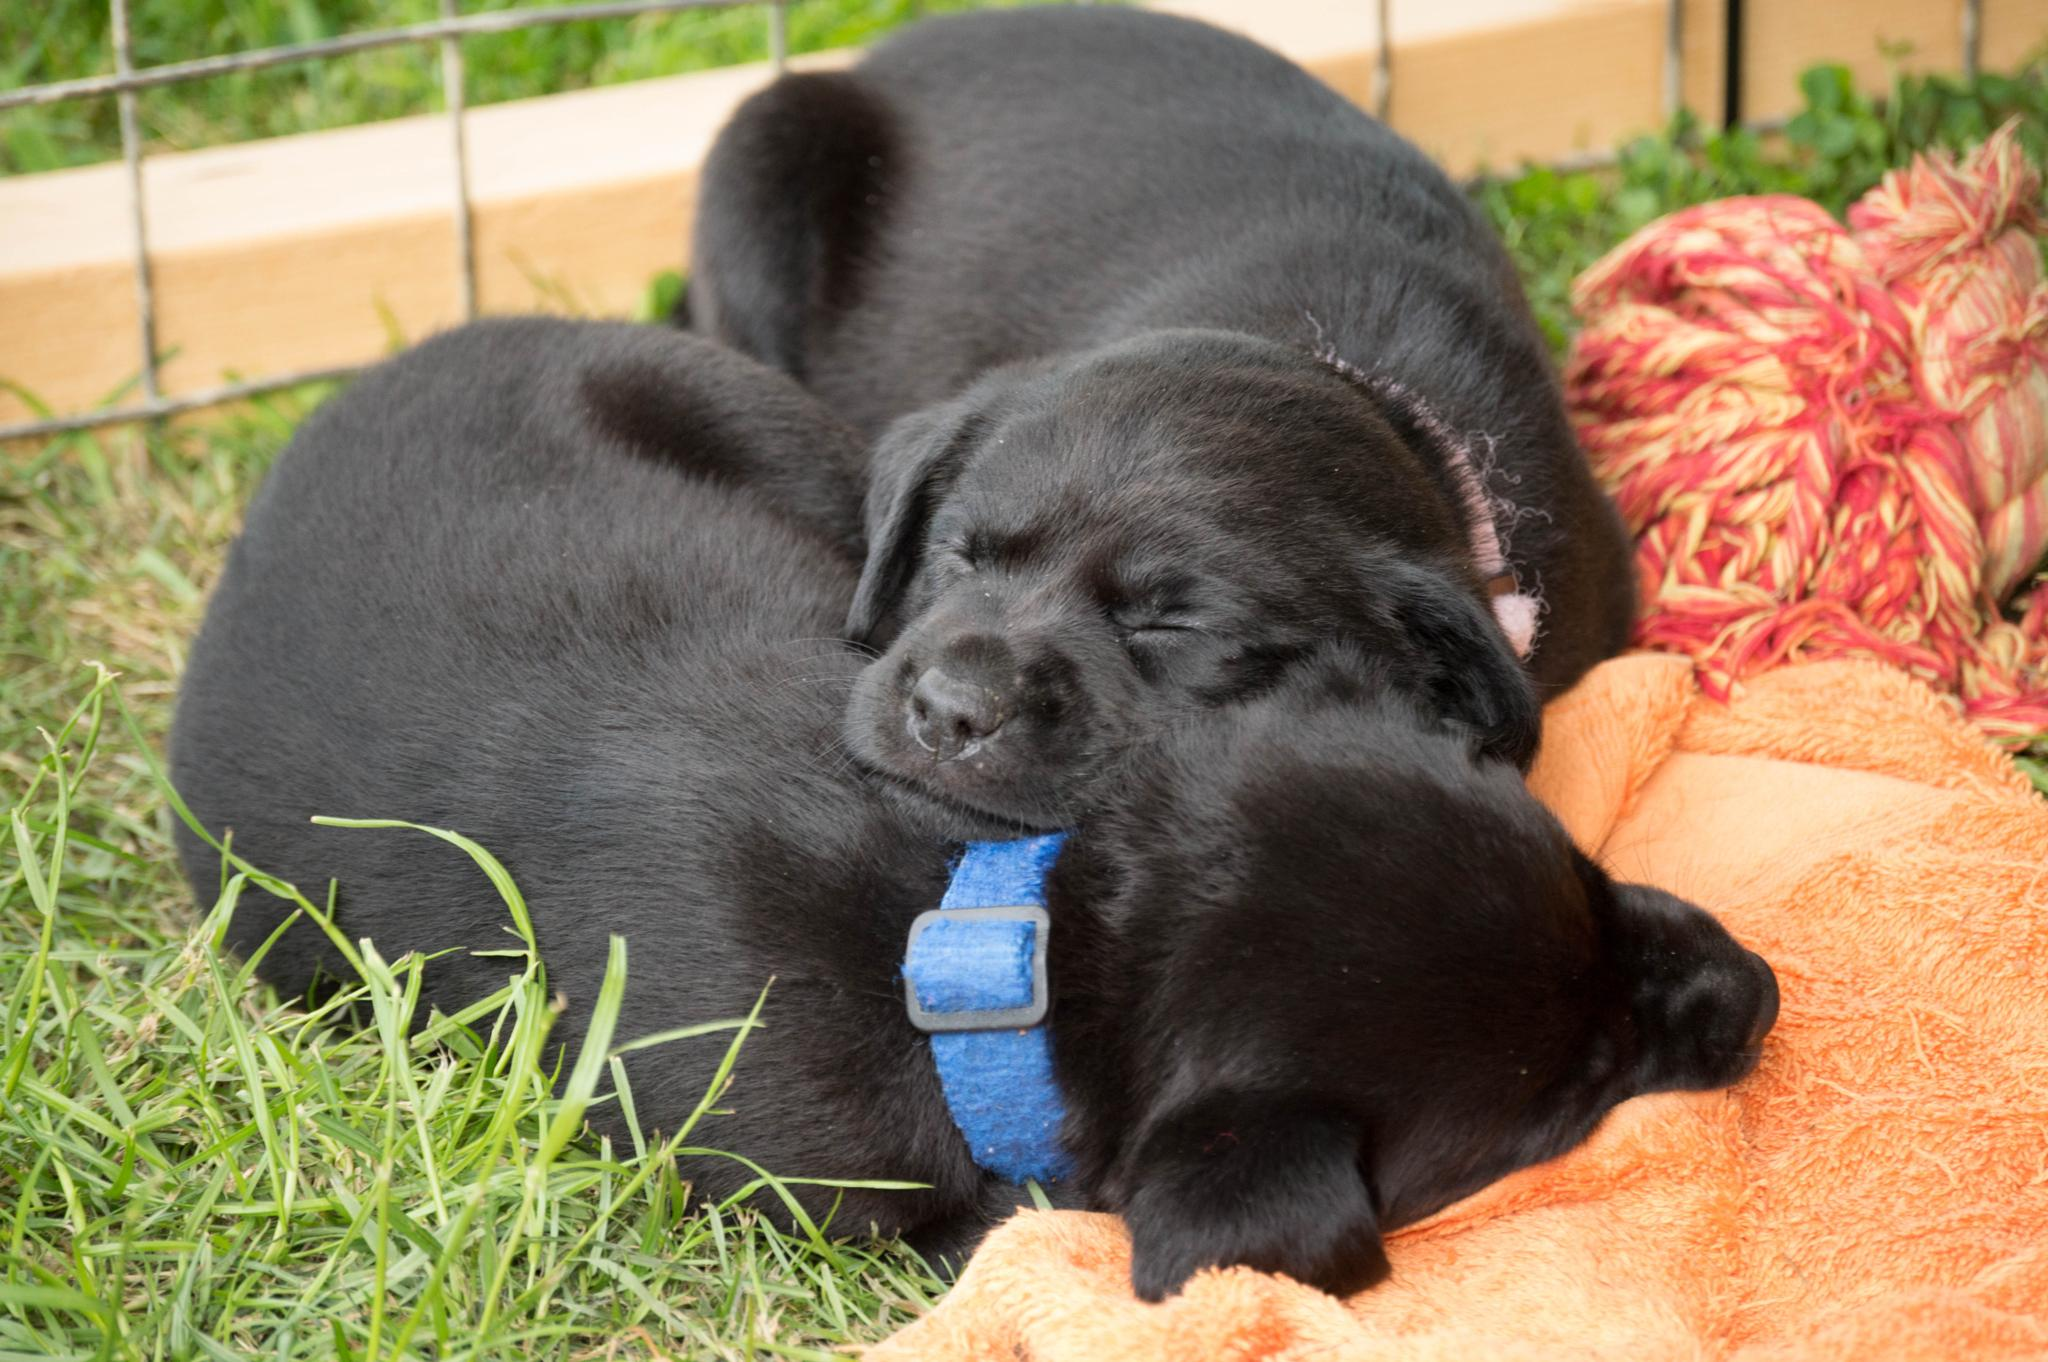 Sleeping Puppies by Jockomorrocco